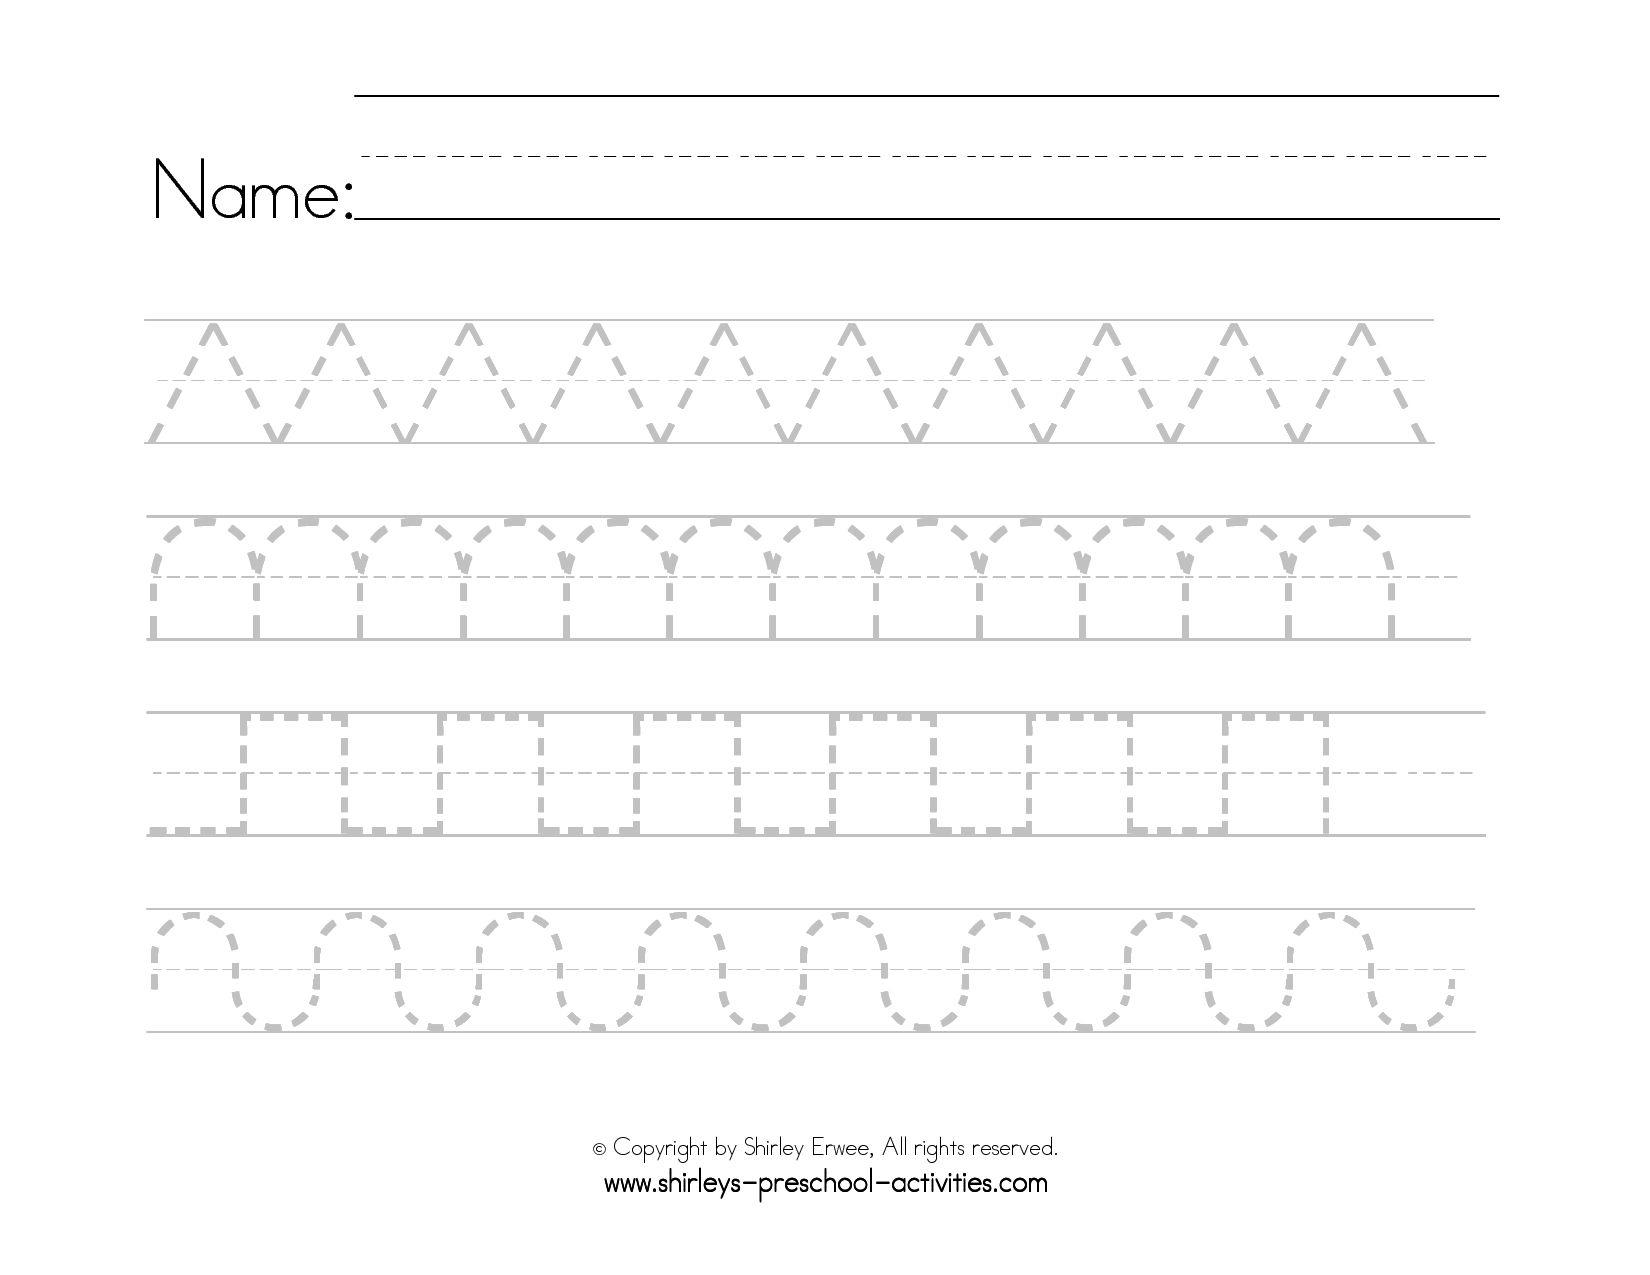 Level Cursive Writing Worksheets Free Printable Worksheets